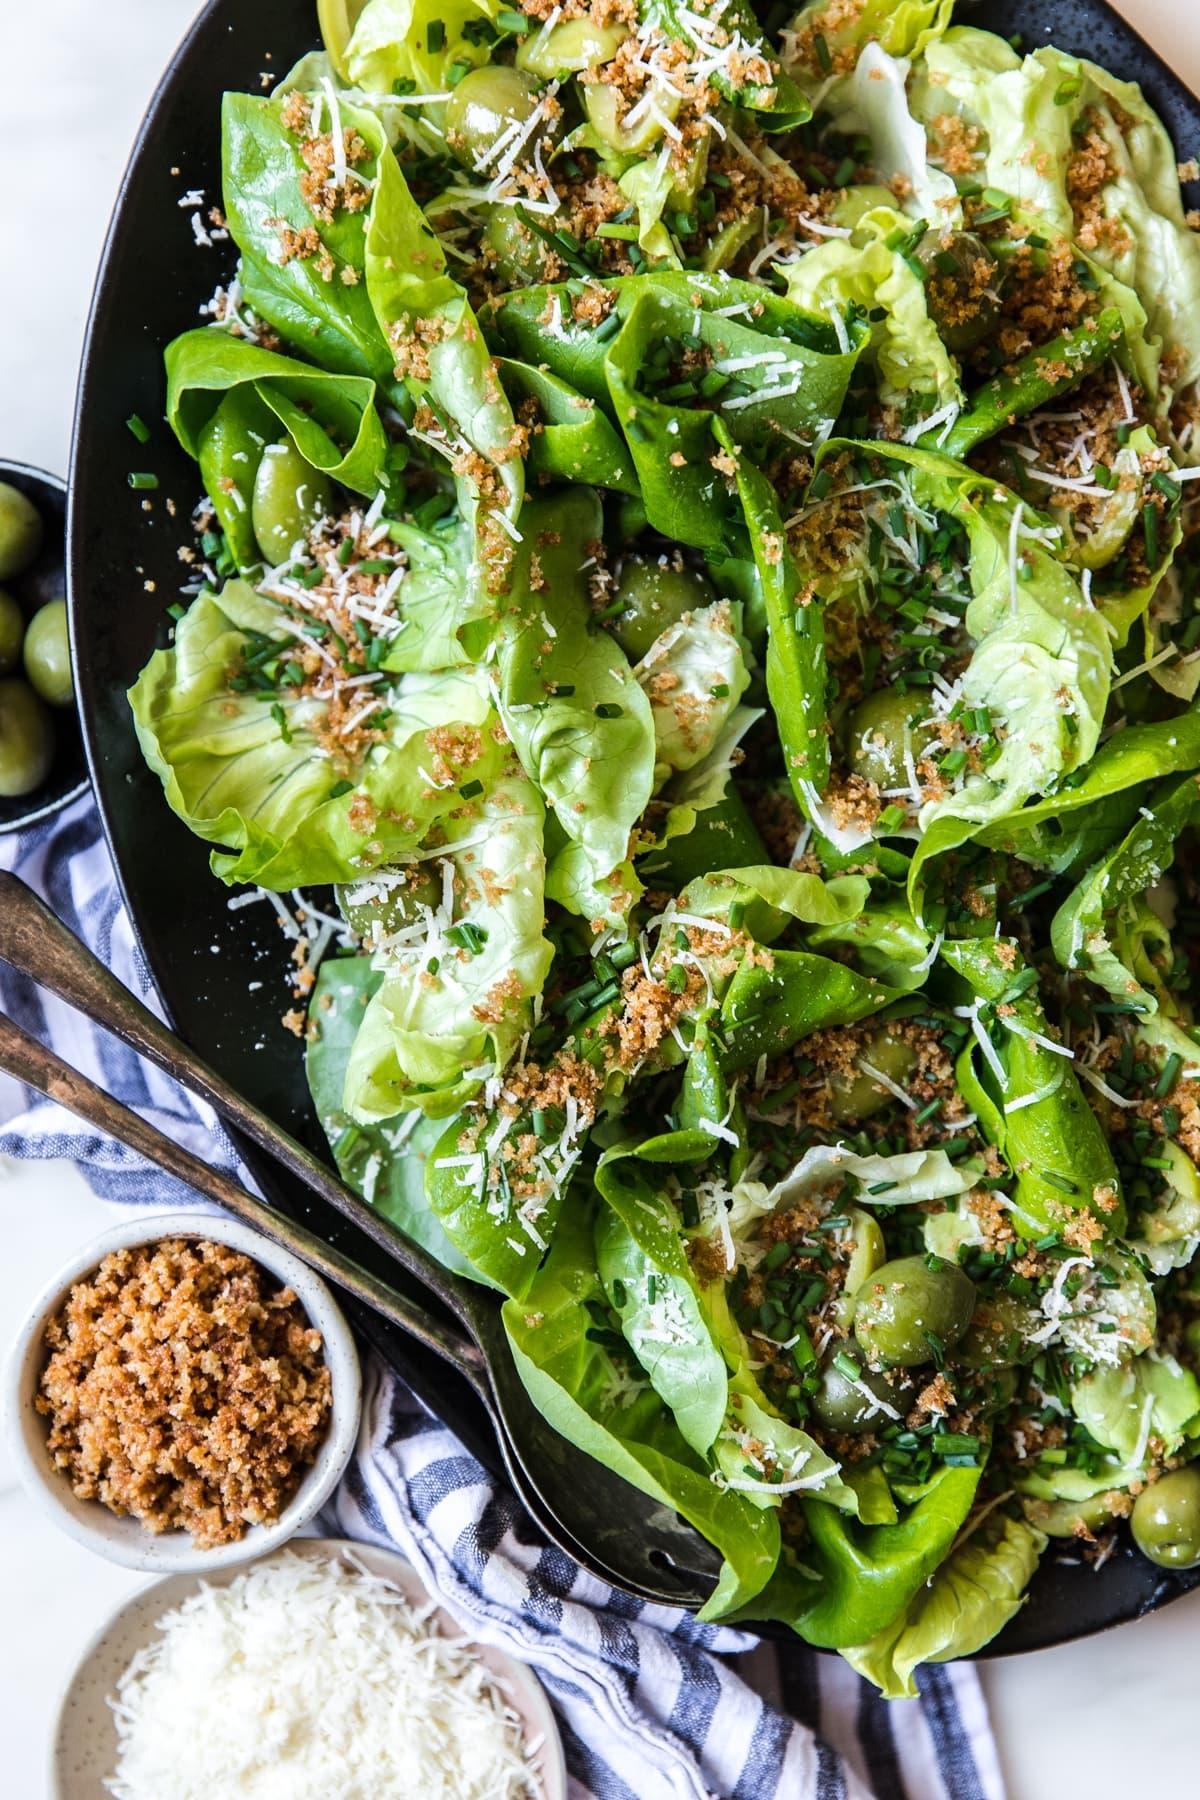 Simple Butter Lettuce Salad The Modern Proper